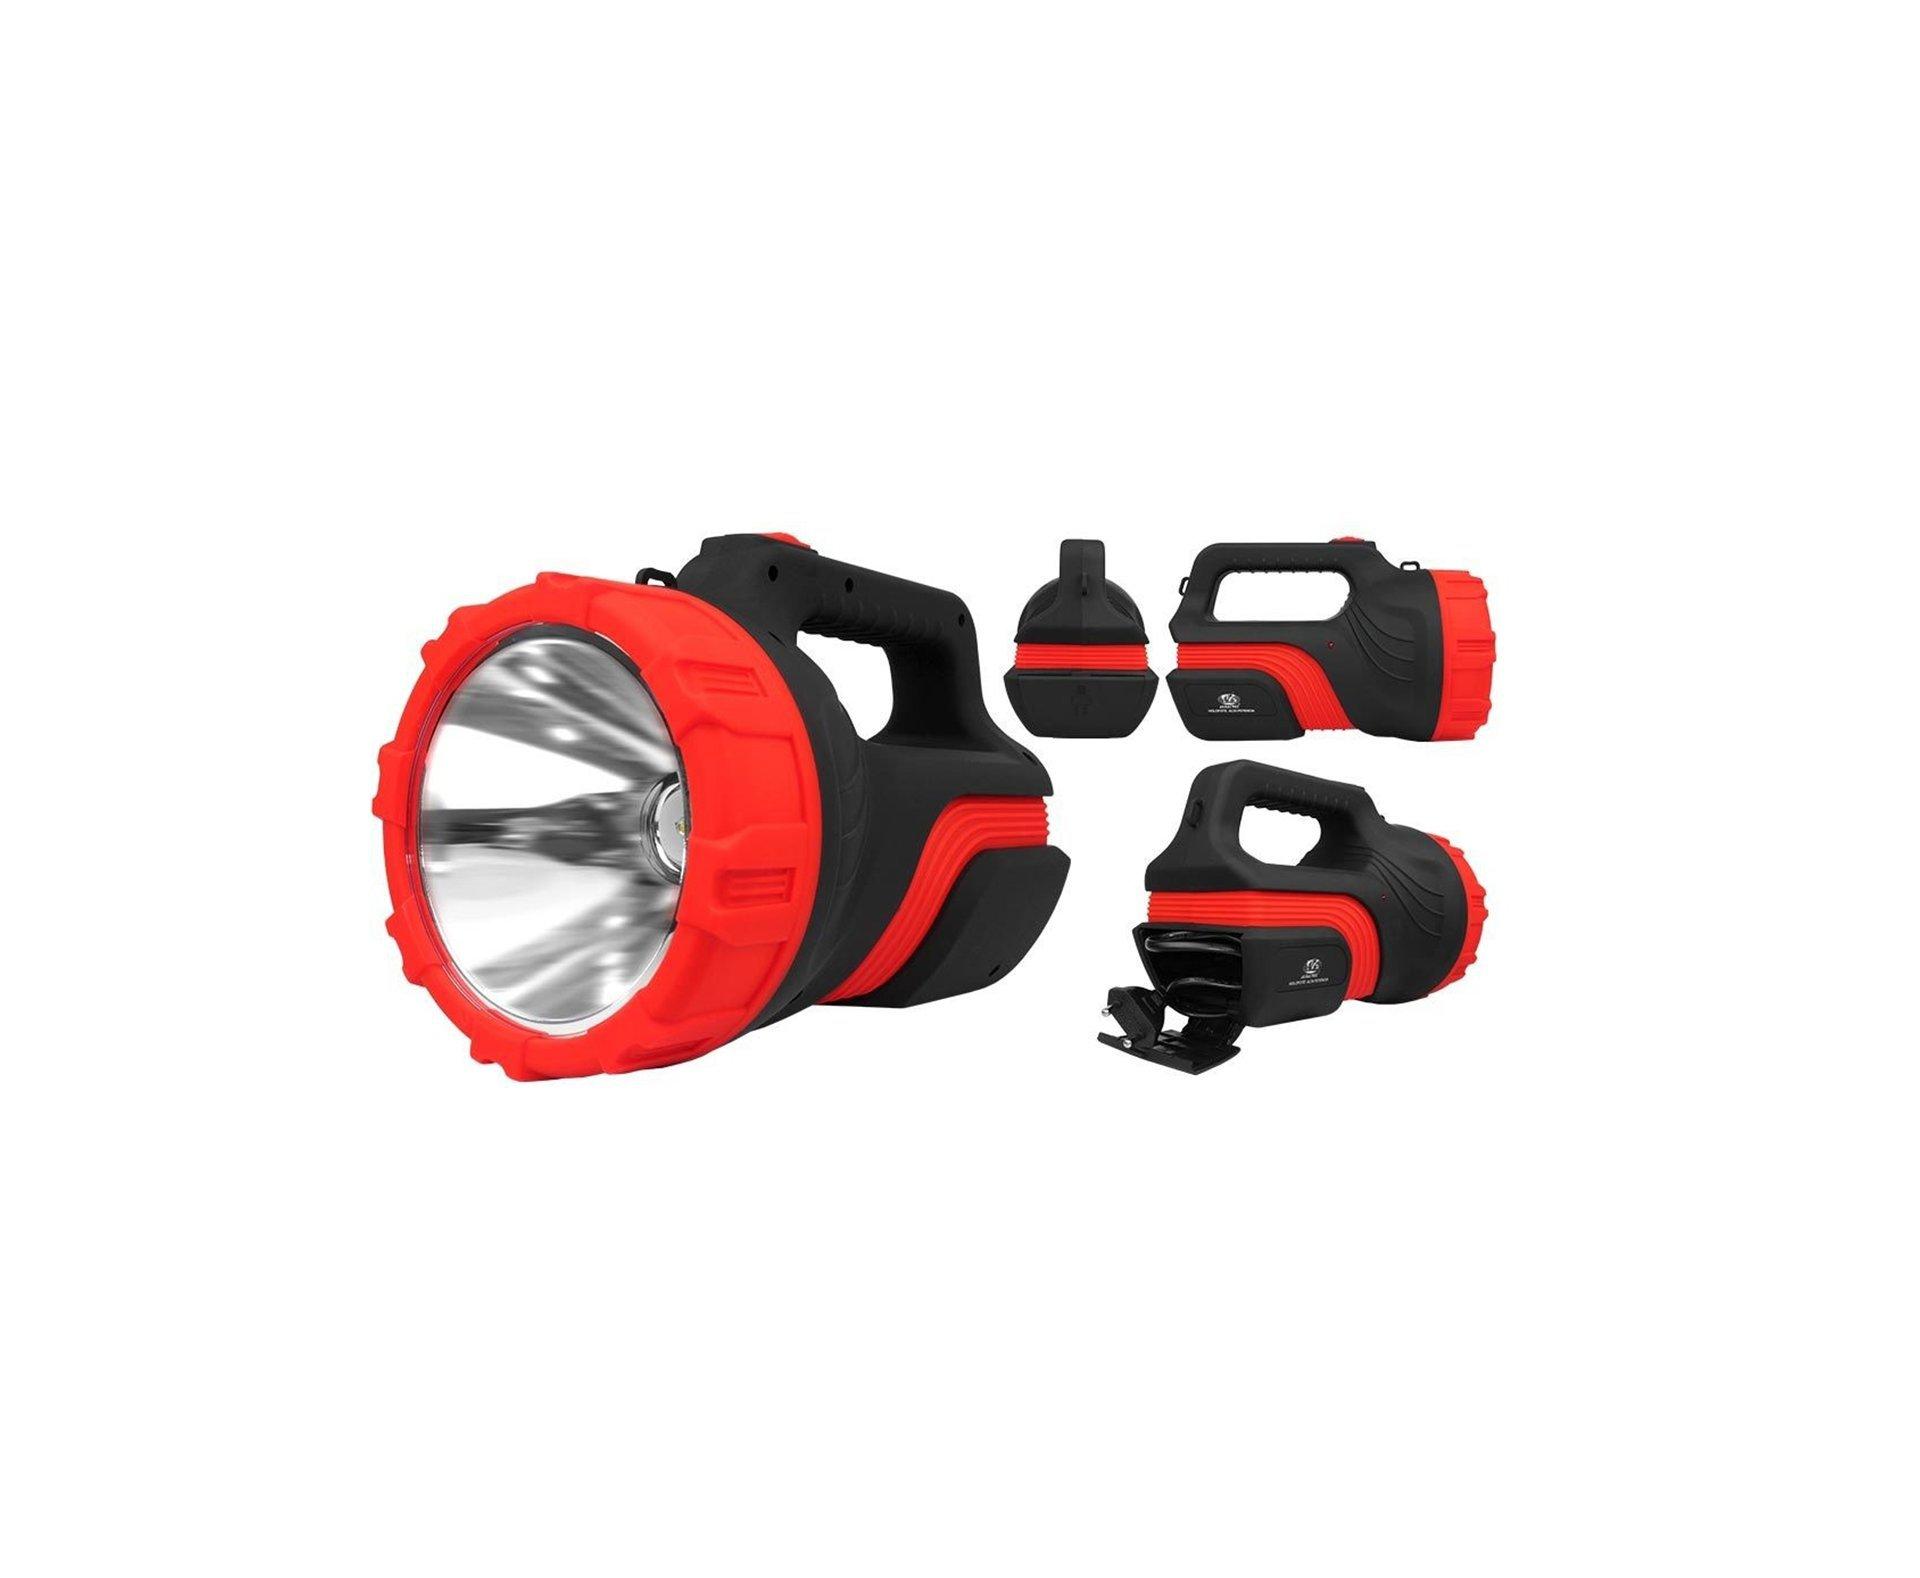 Holofote/lanterna Recarregavel 7078  1led  8w Alcance Ate 1000 Metros - Albatroz